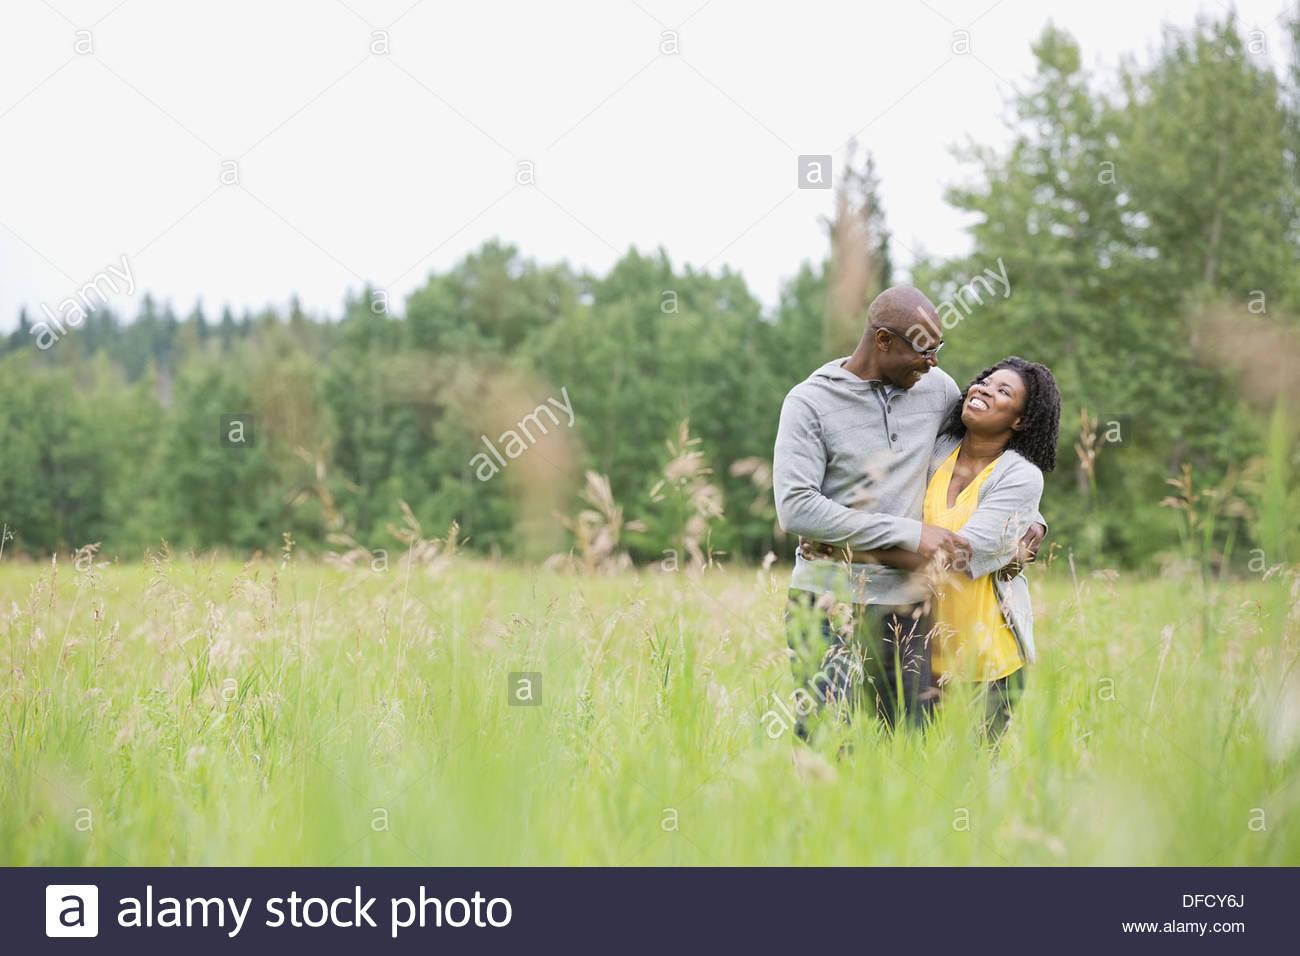 Woman embracing husband outdoors - Stock Image